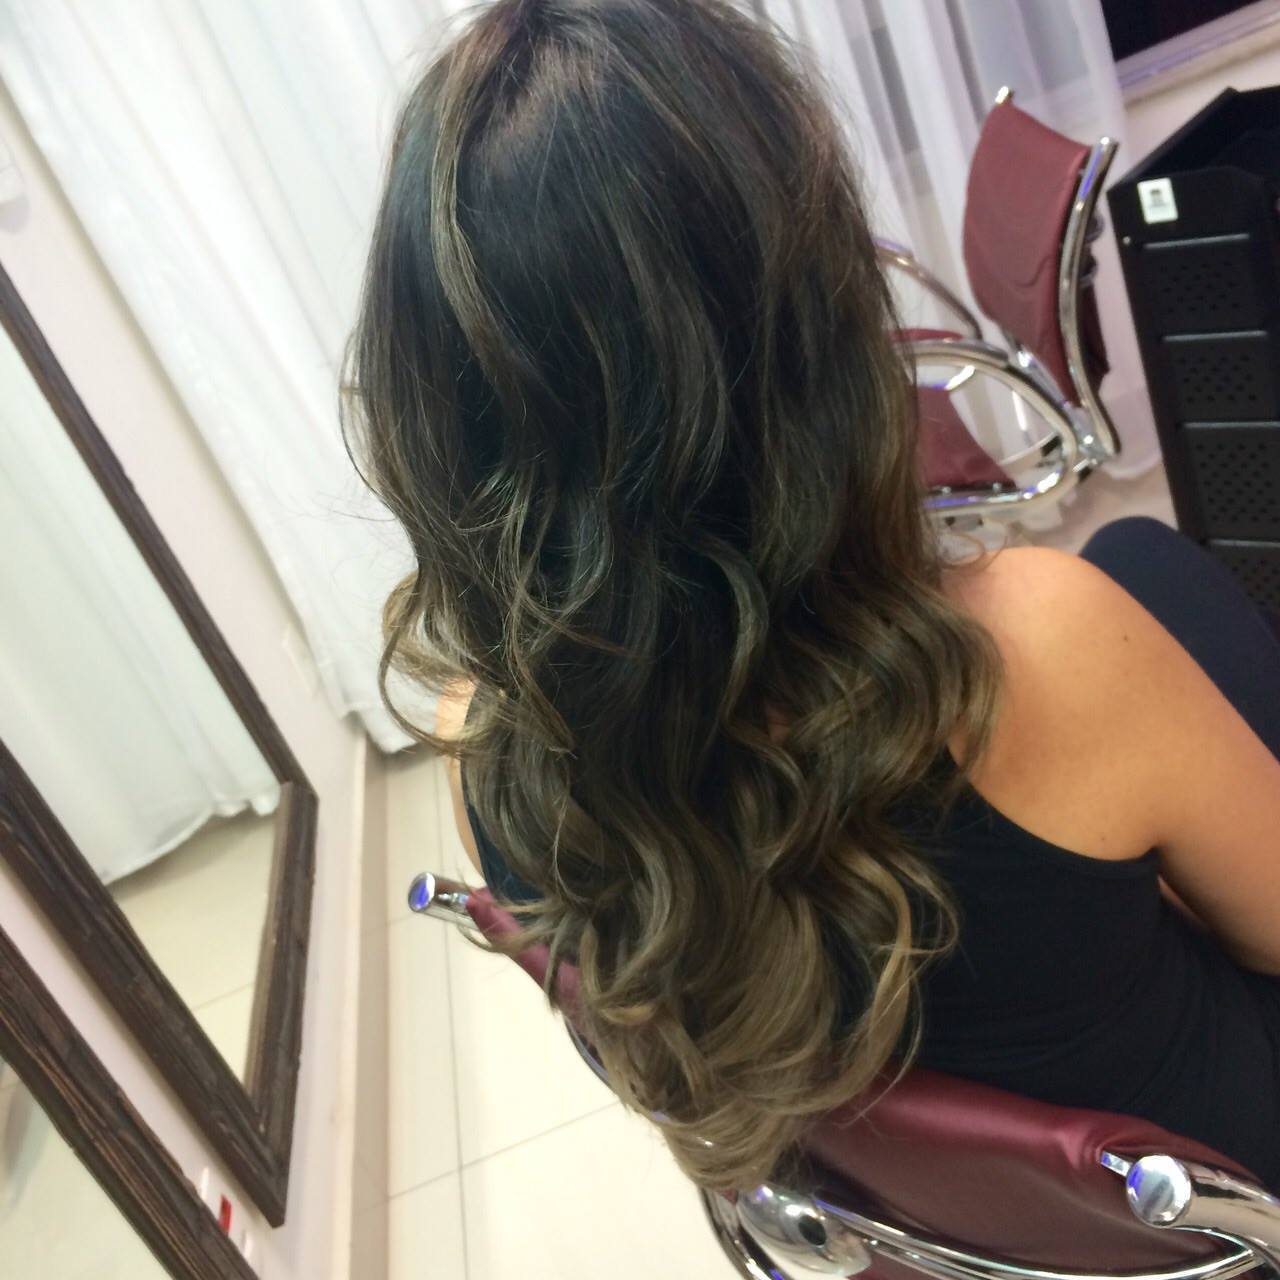 cabelos cabeleireiro(a) maquiador(a) consultor(a)